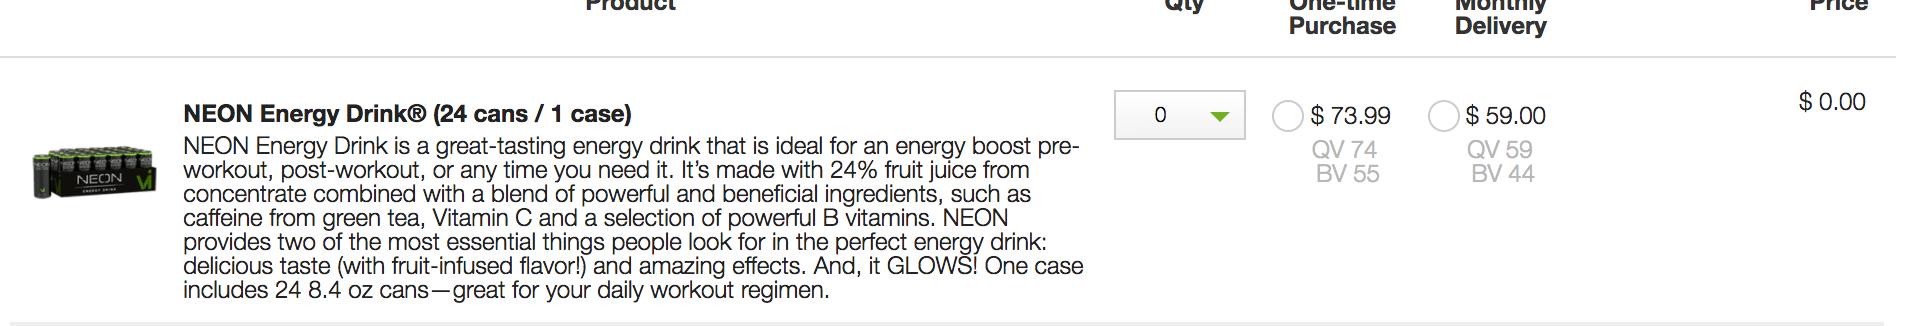 VI Neon Energy Drink Cost